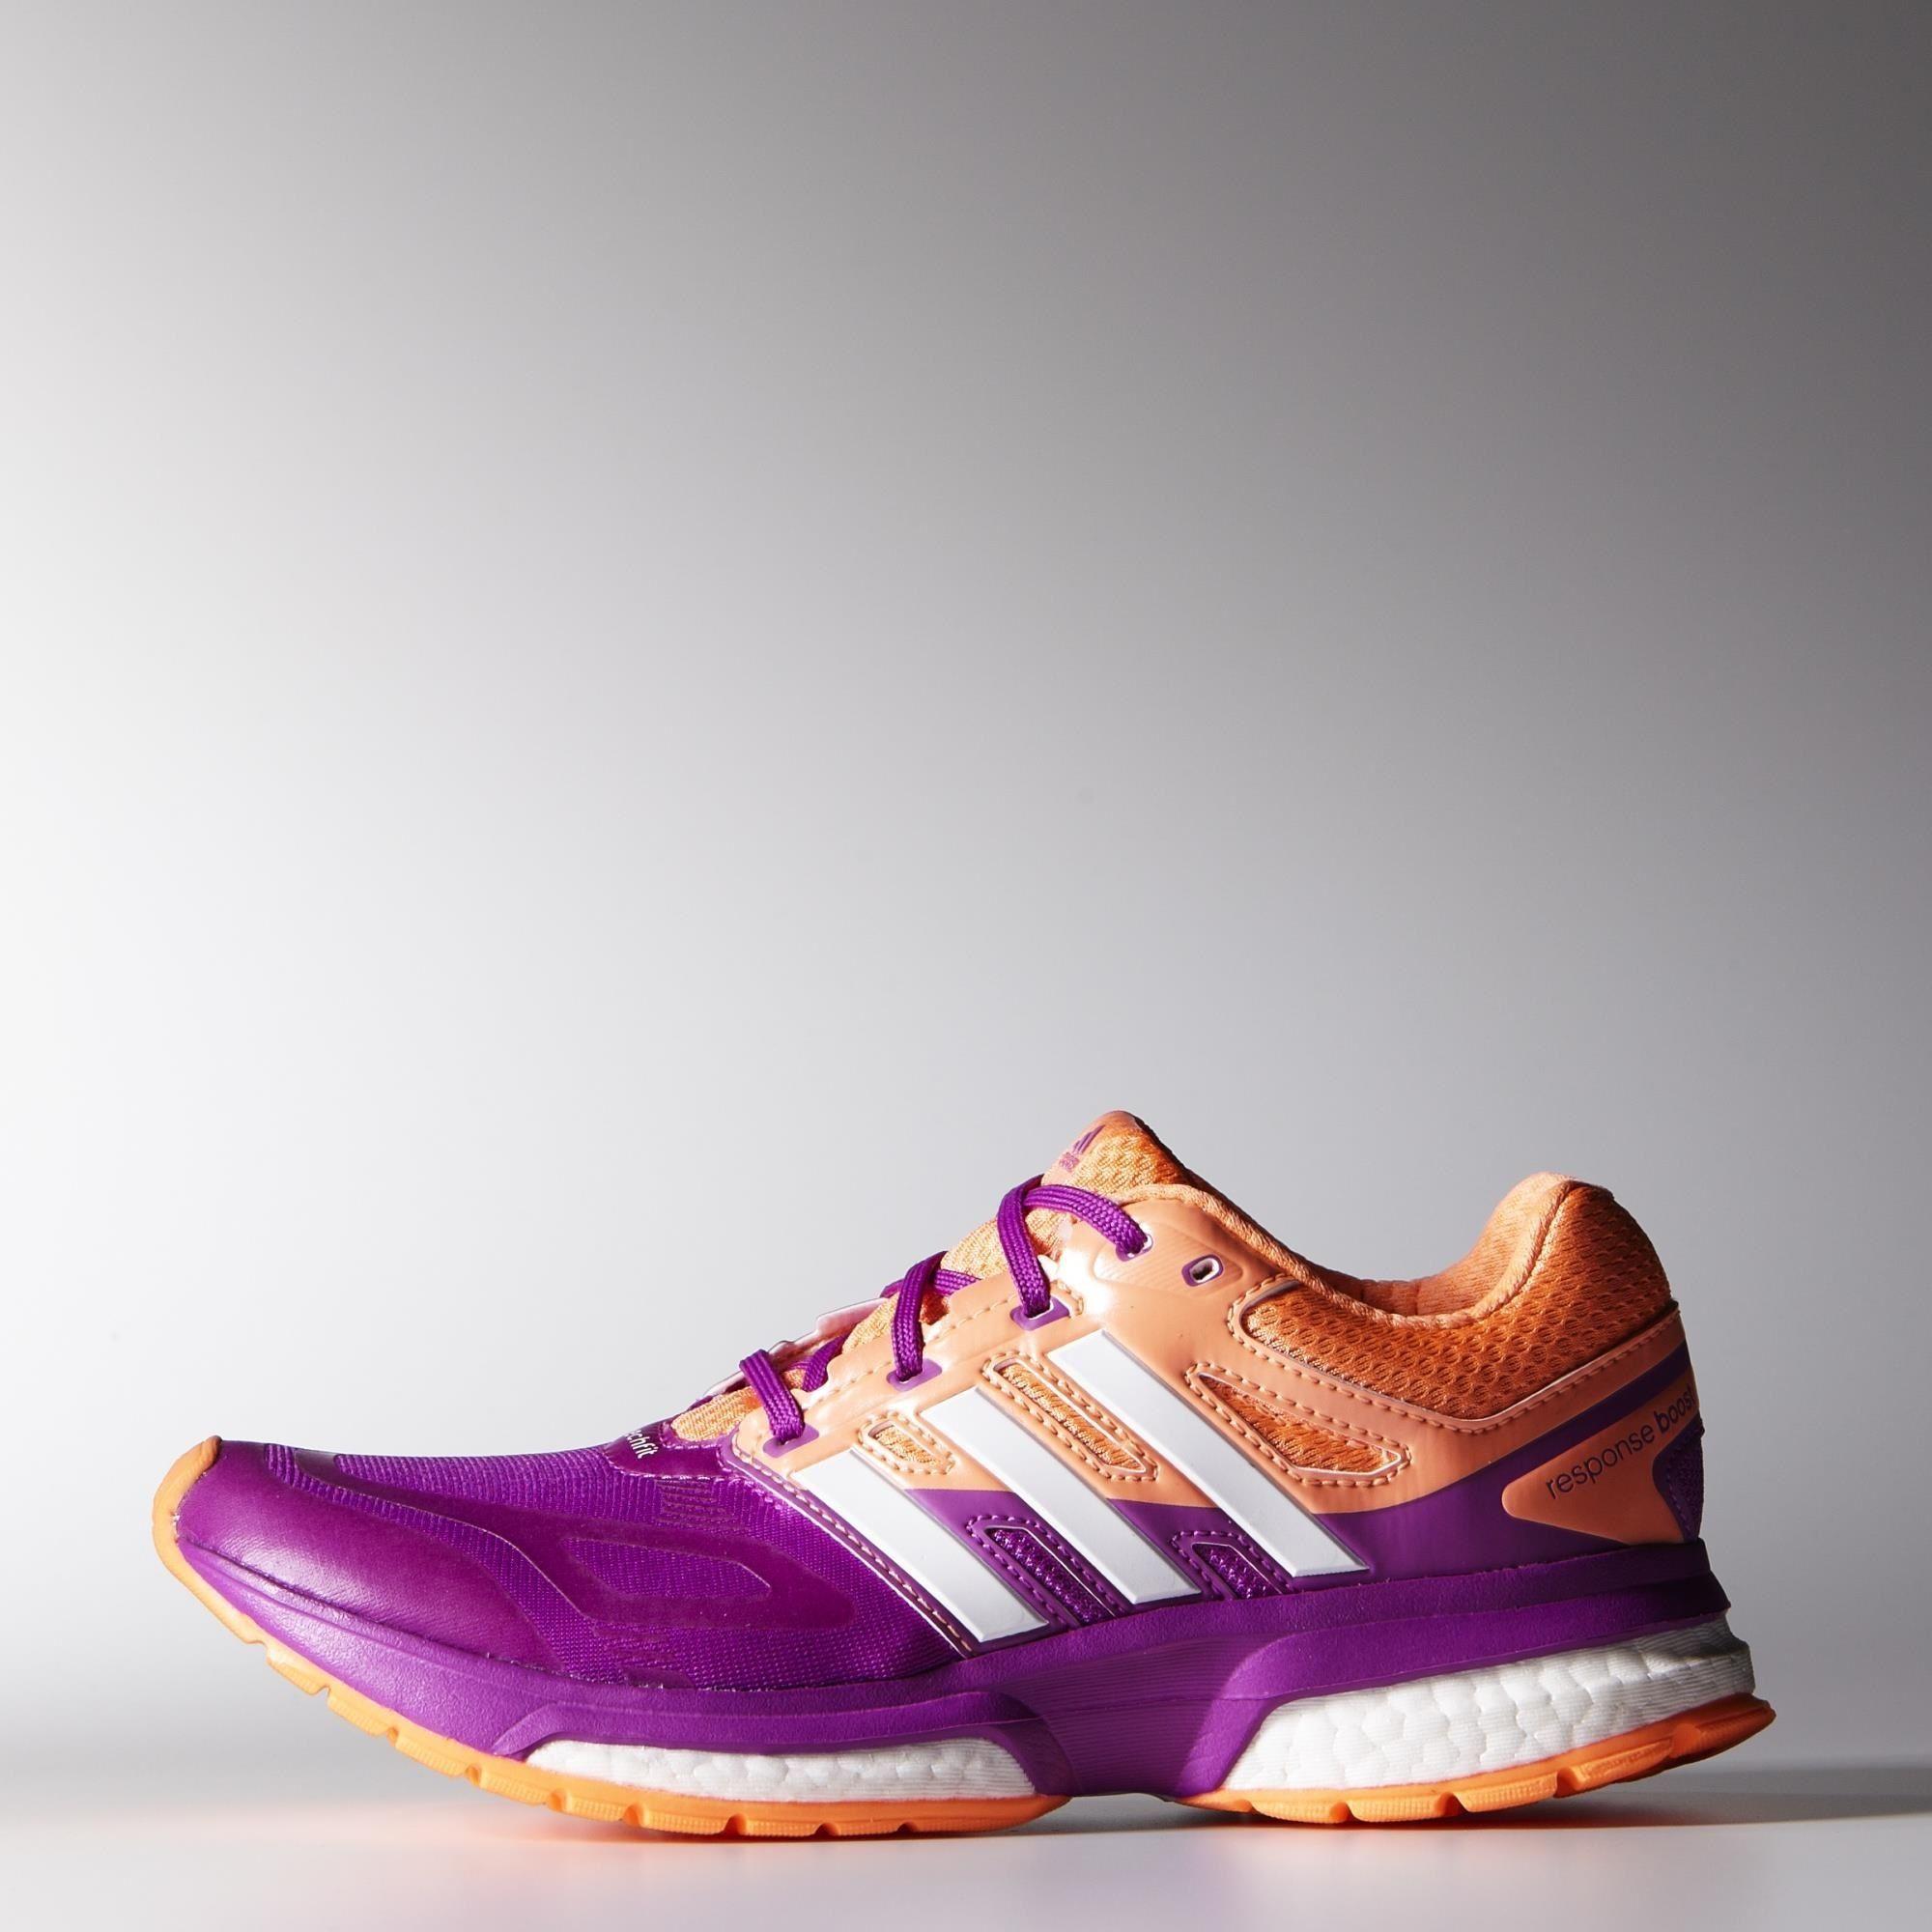 adidas Response Boost Techfit Shoes Pink adidas